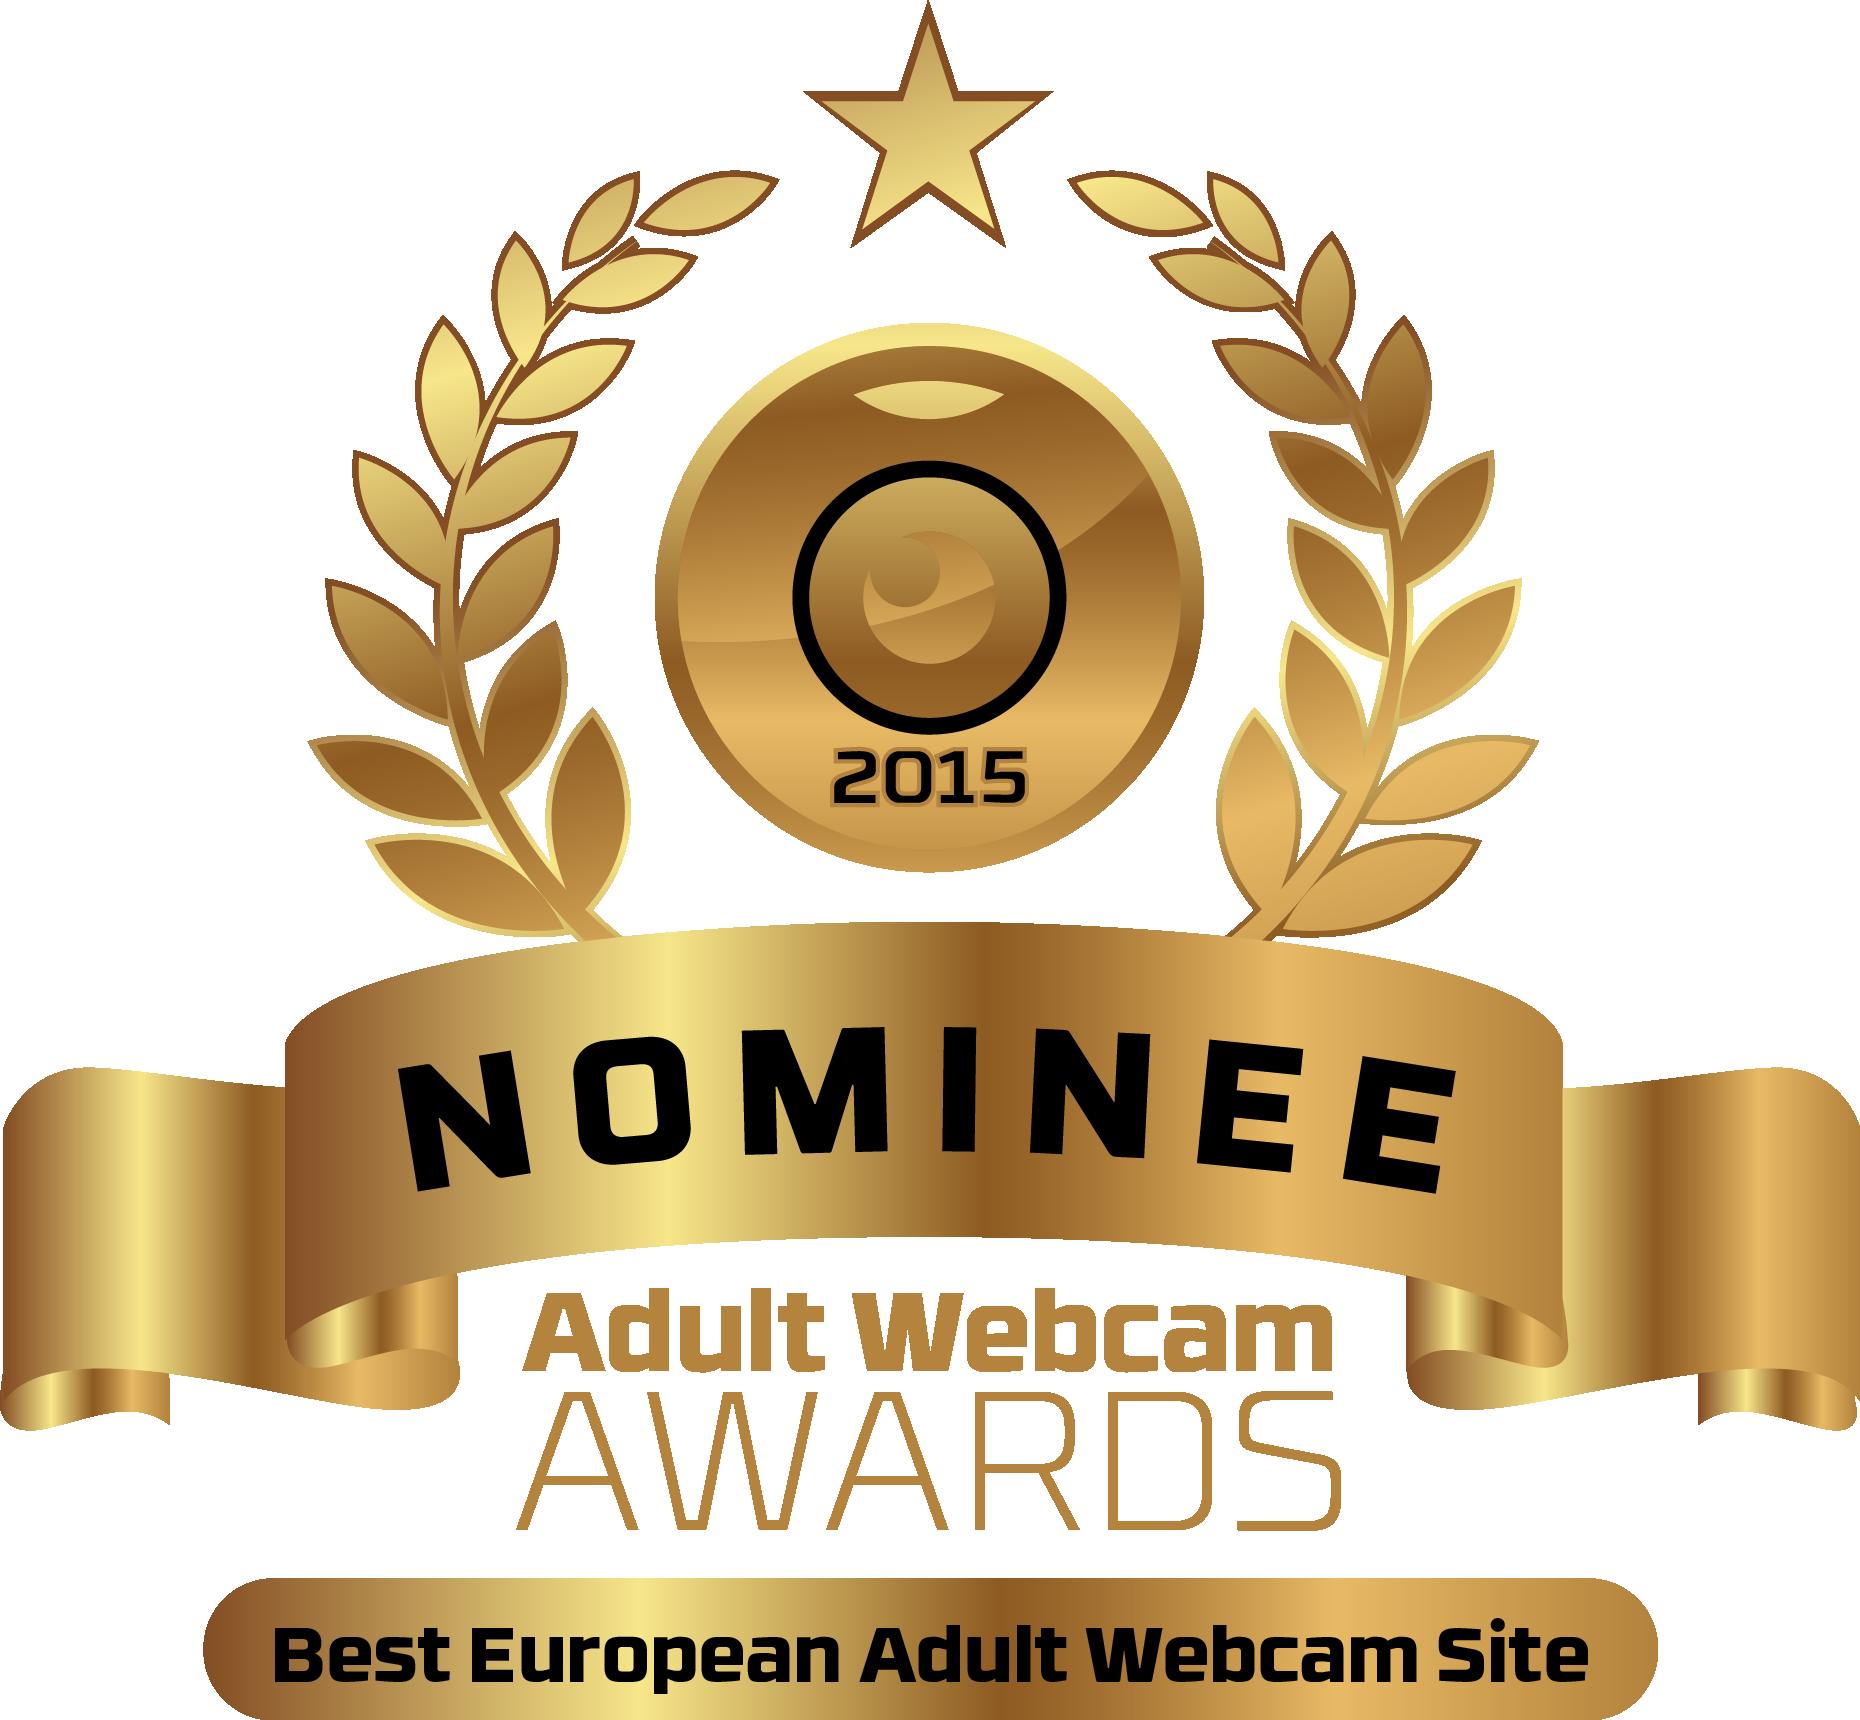 Best European Adult Webcam Site Nominee